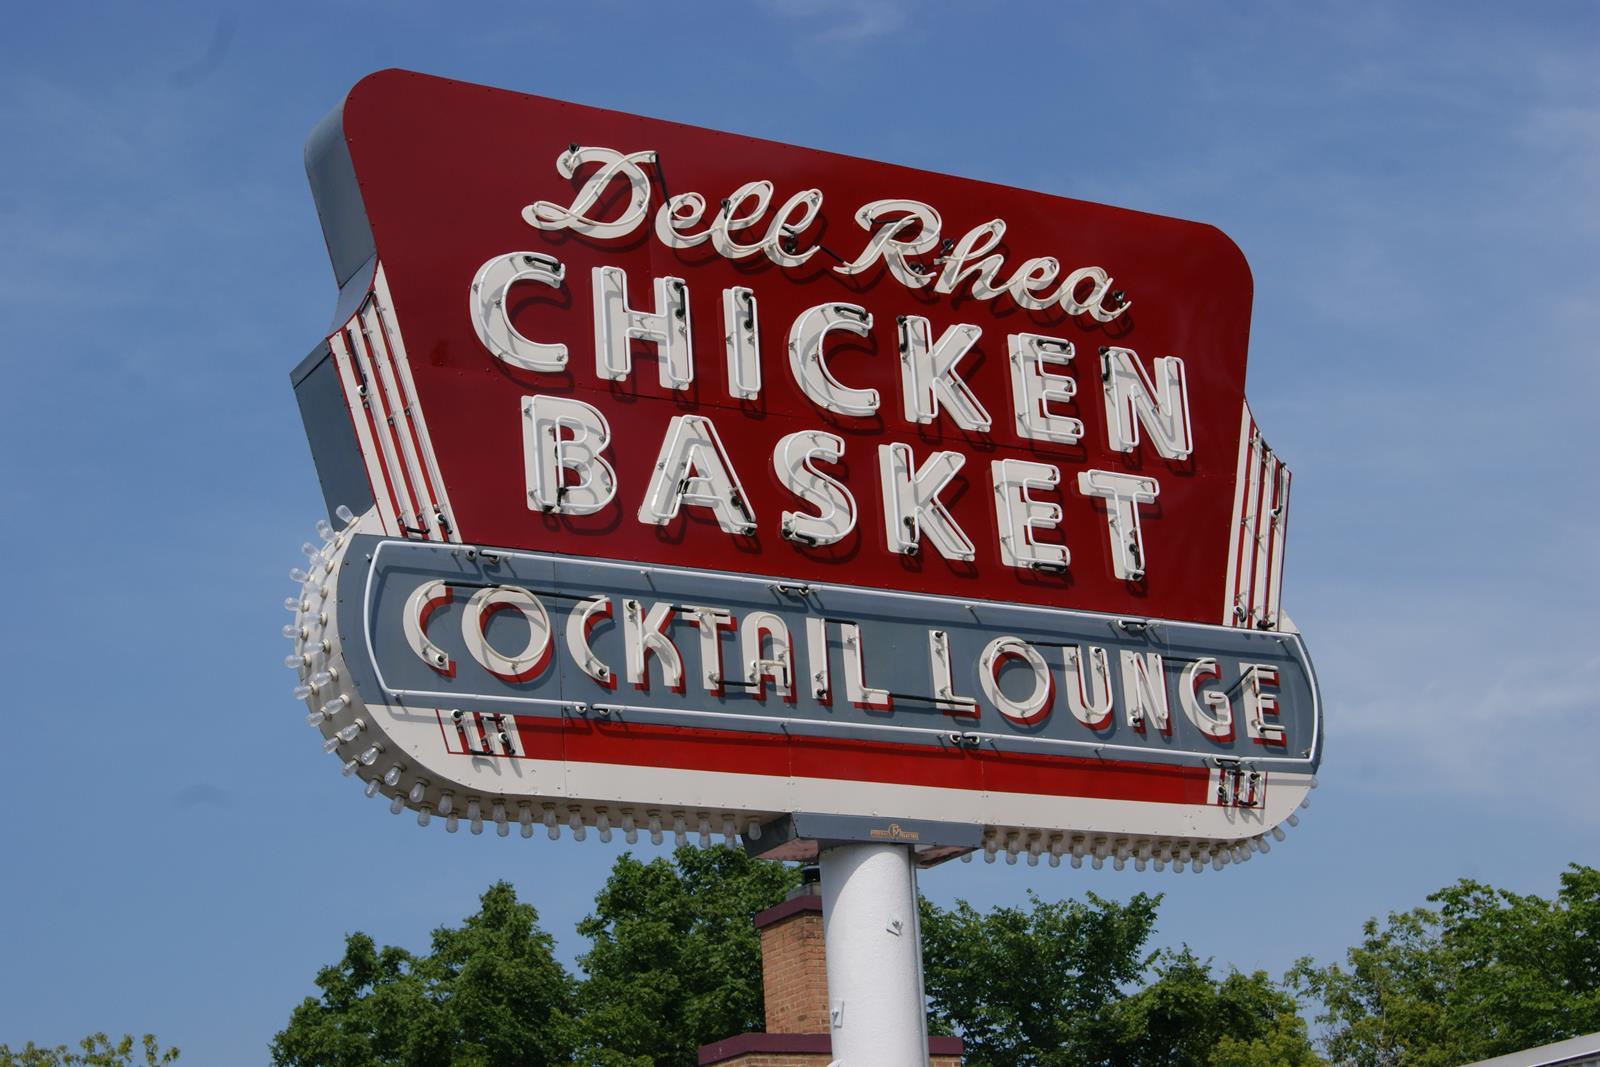 Dell Rhea's Chicken Basket